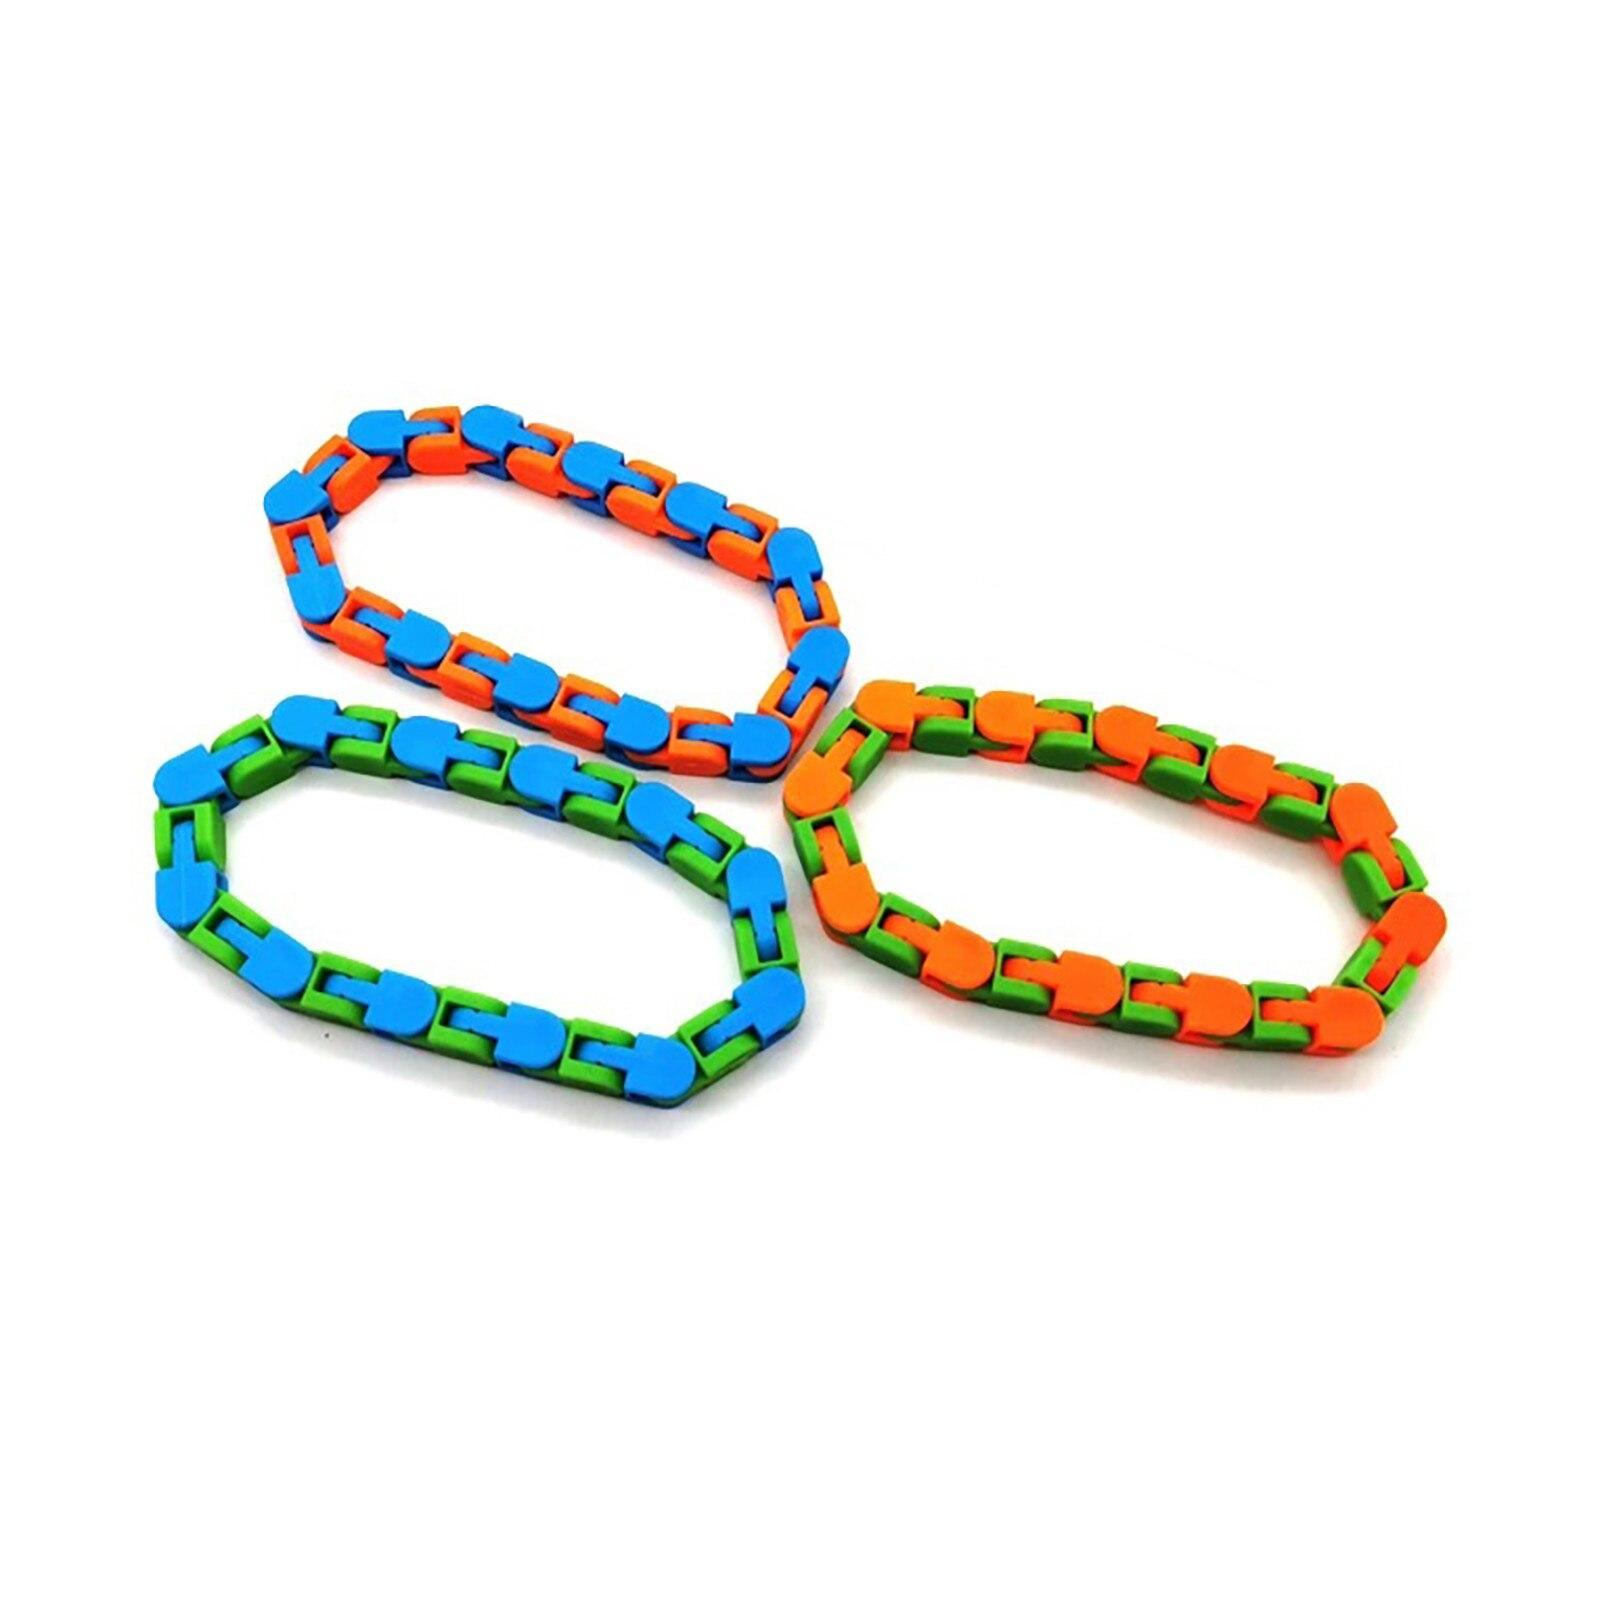 Fidget-Toys Stress Tangle Relief-Rotate Sensory Colorful Shape 24-Bit Puzzle Zabawki img5